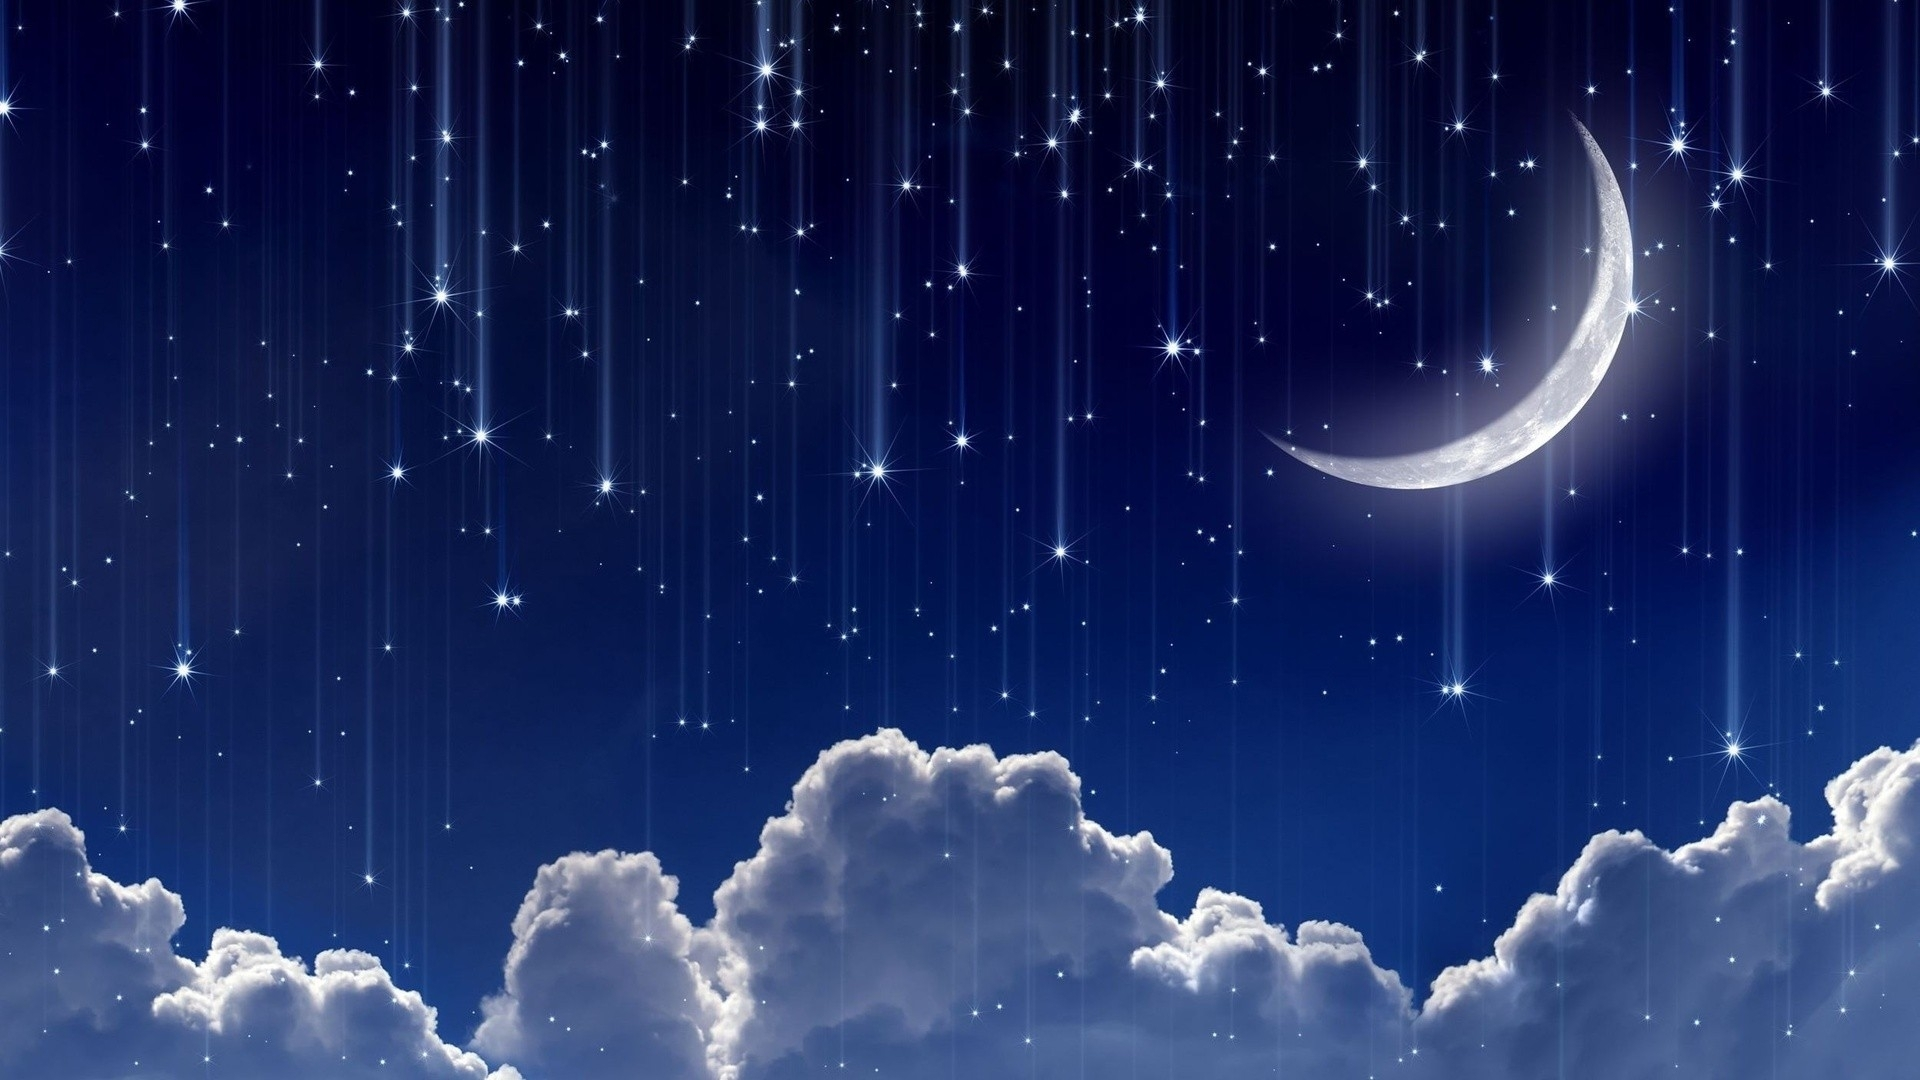 wallpaper : digital art, night, sky, blue background, stars, clouds